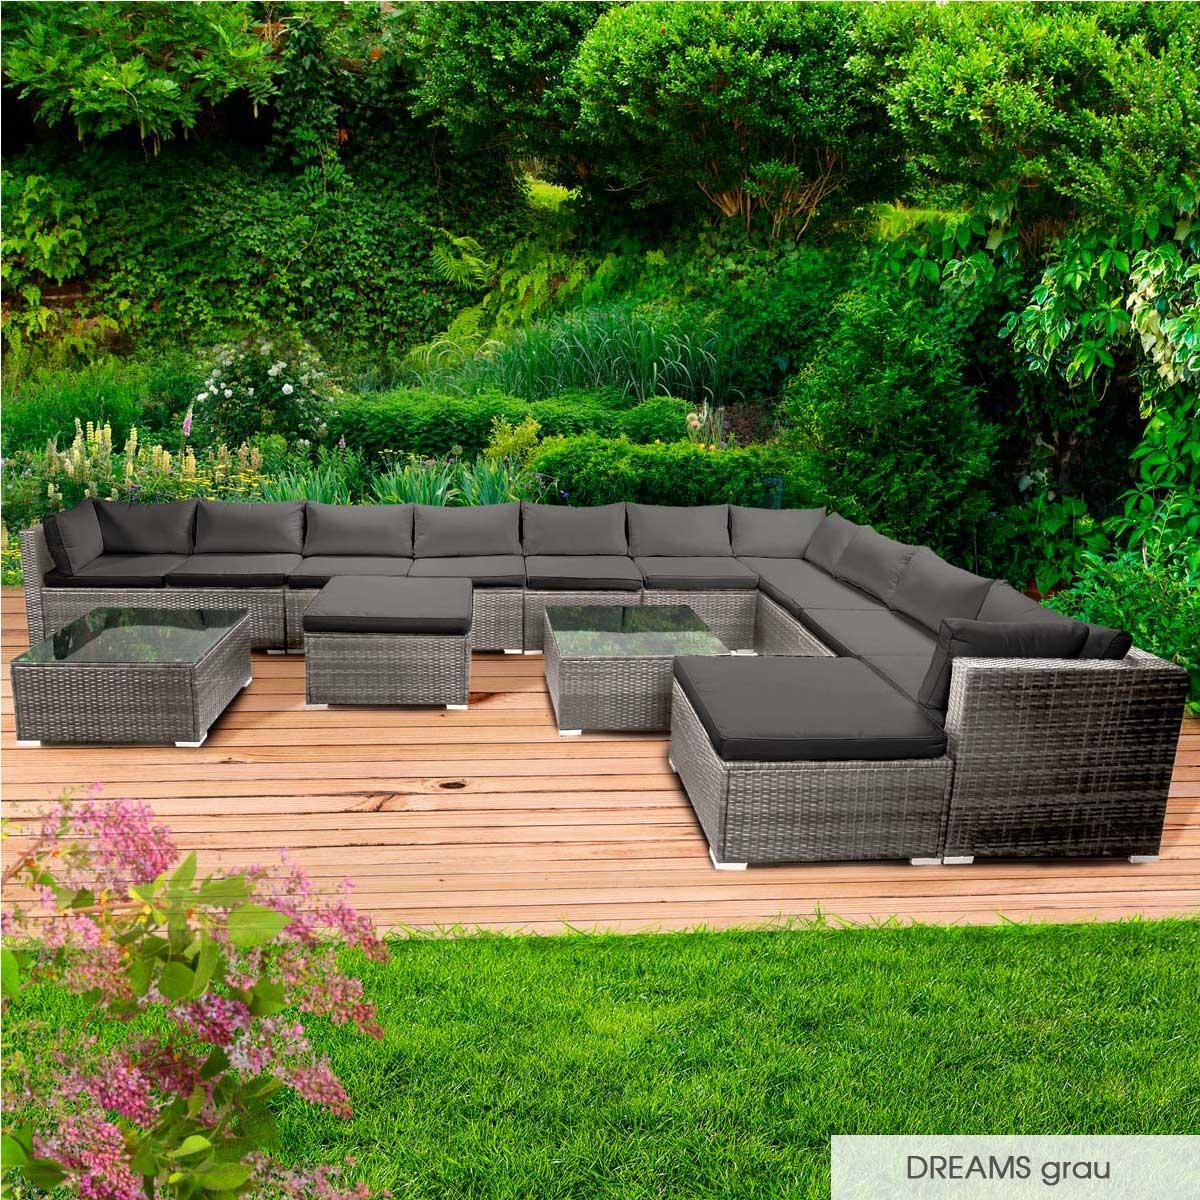 Gartenmoebel-Poly-Rattan-Lounge-Moebel-Sitzgarnitur-Gartengarnitur-Sitzgruppe-Sofa Indexbild 70